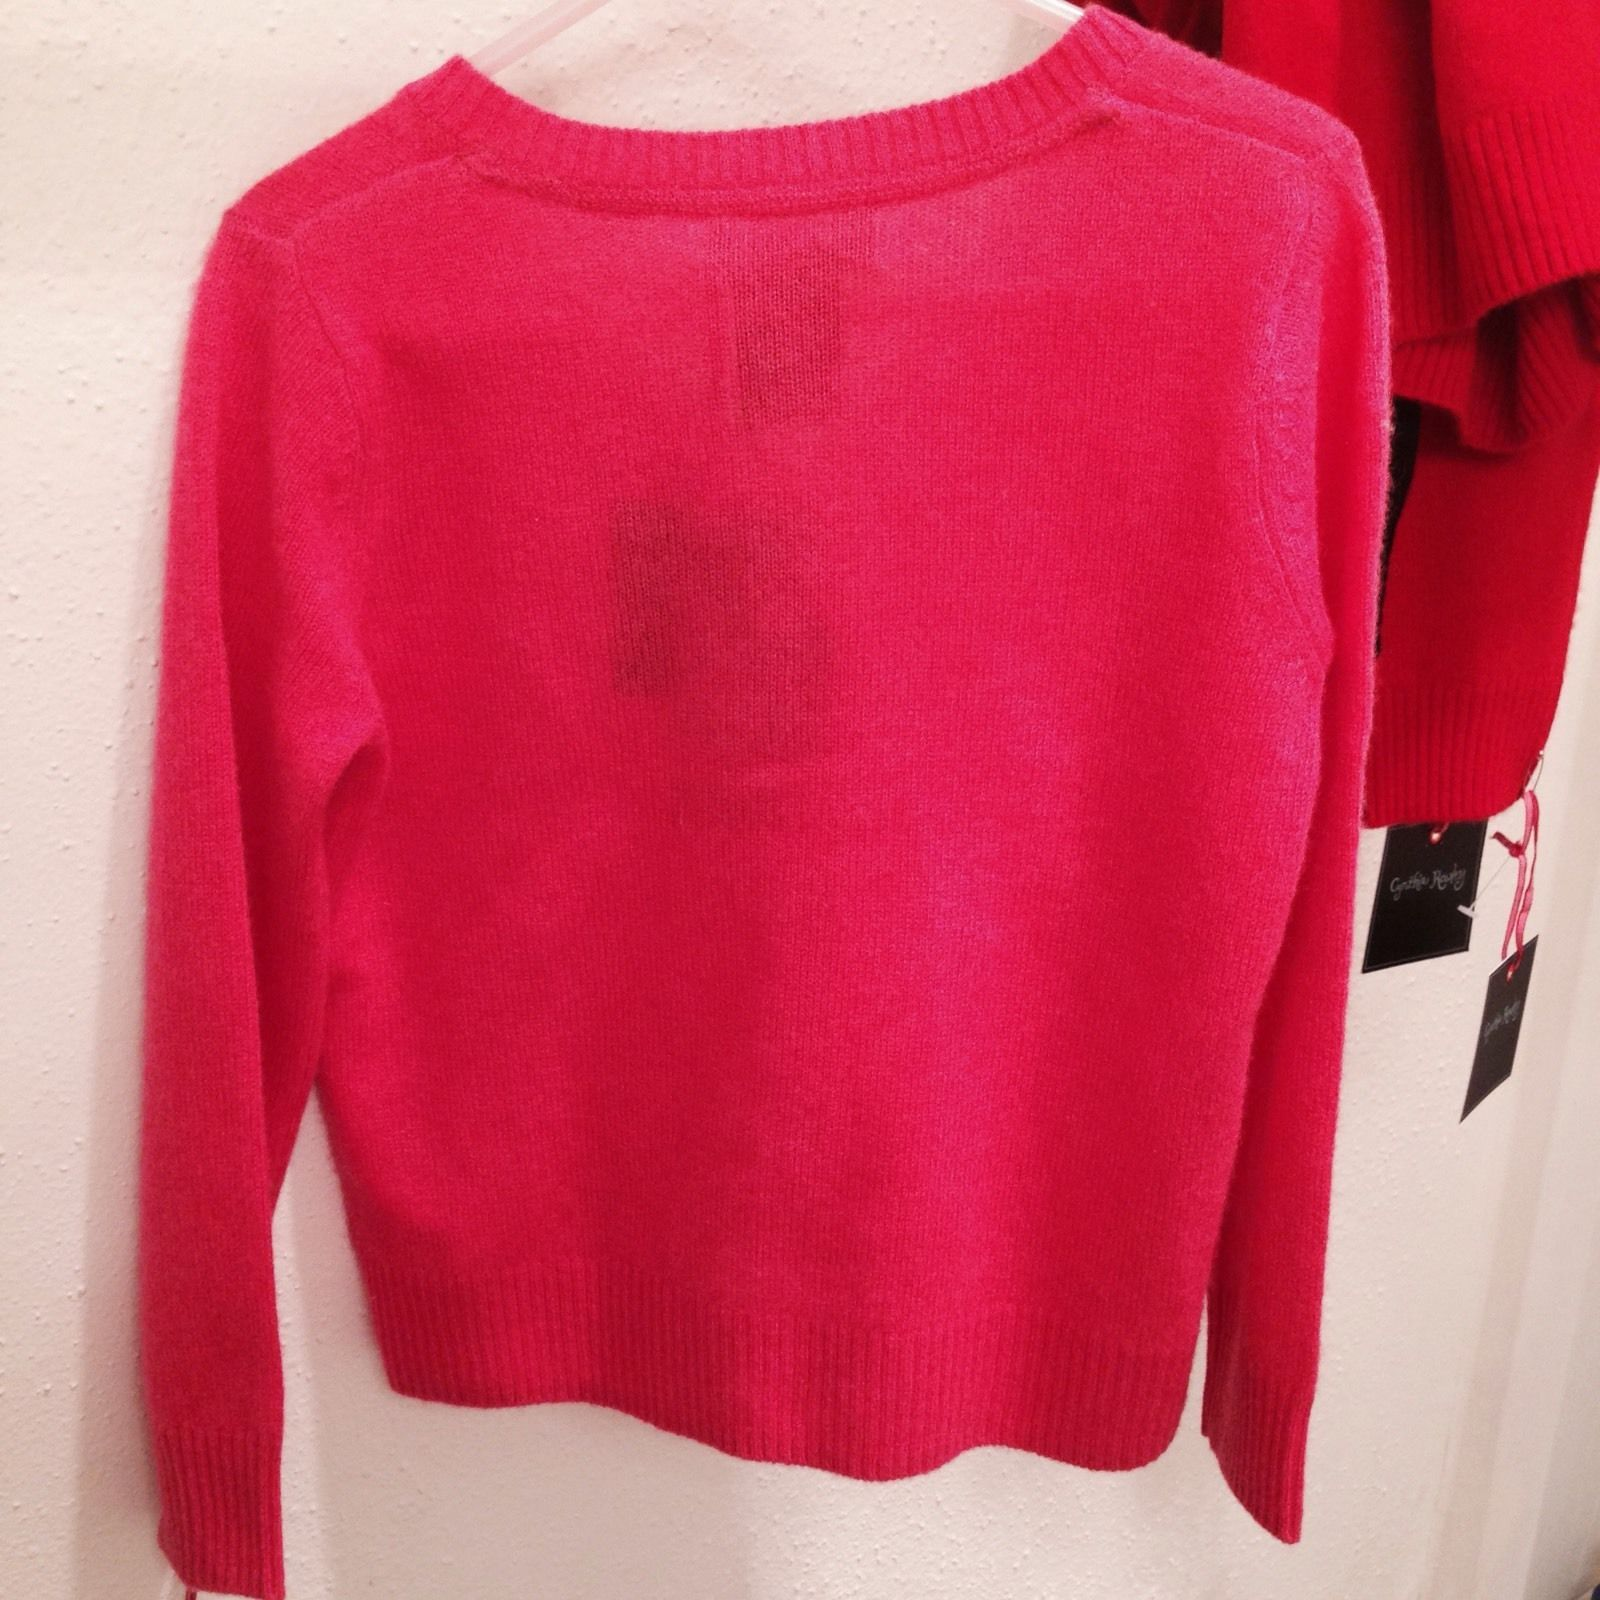 NWT-Boys Wonderkids Red Christmas Holiday Long Sleeve Argyle Sweater-sz 18 mths